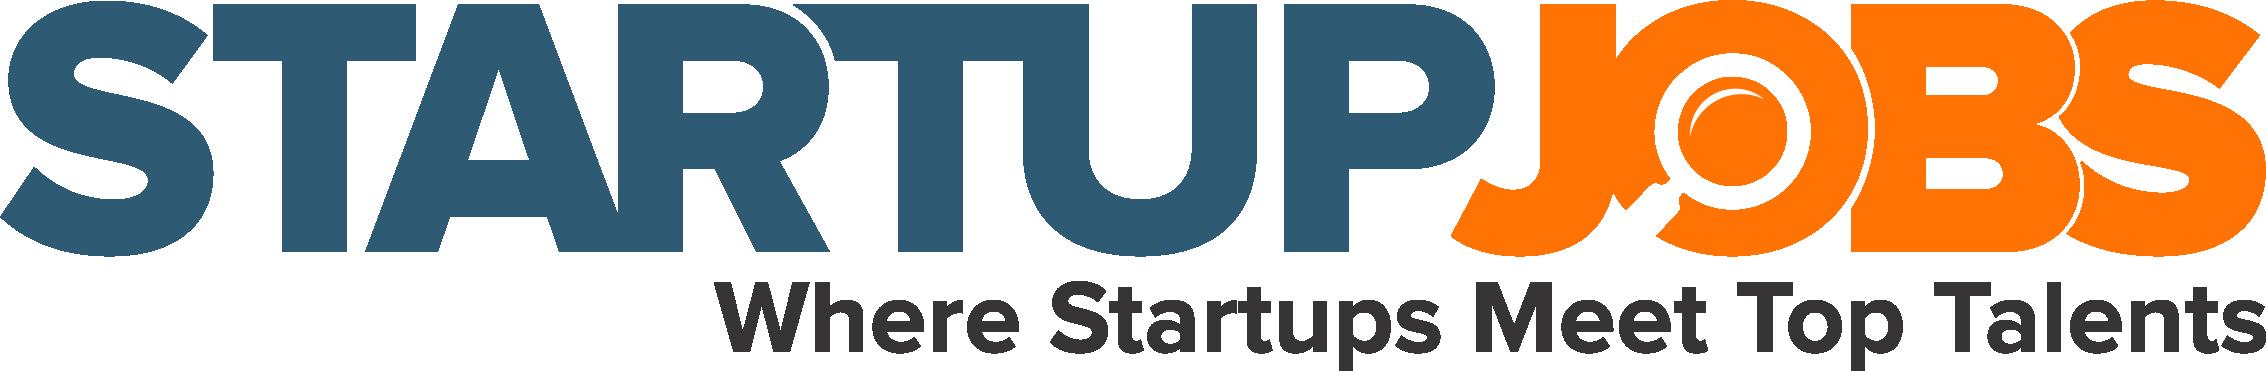 startupjobs-app